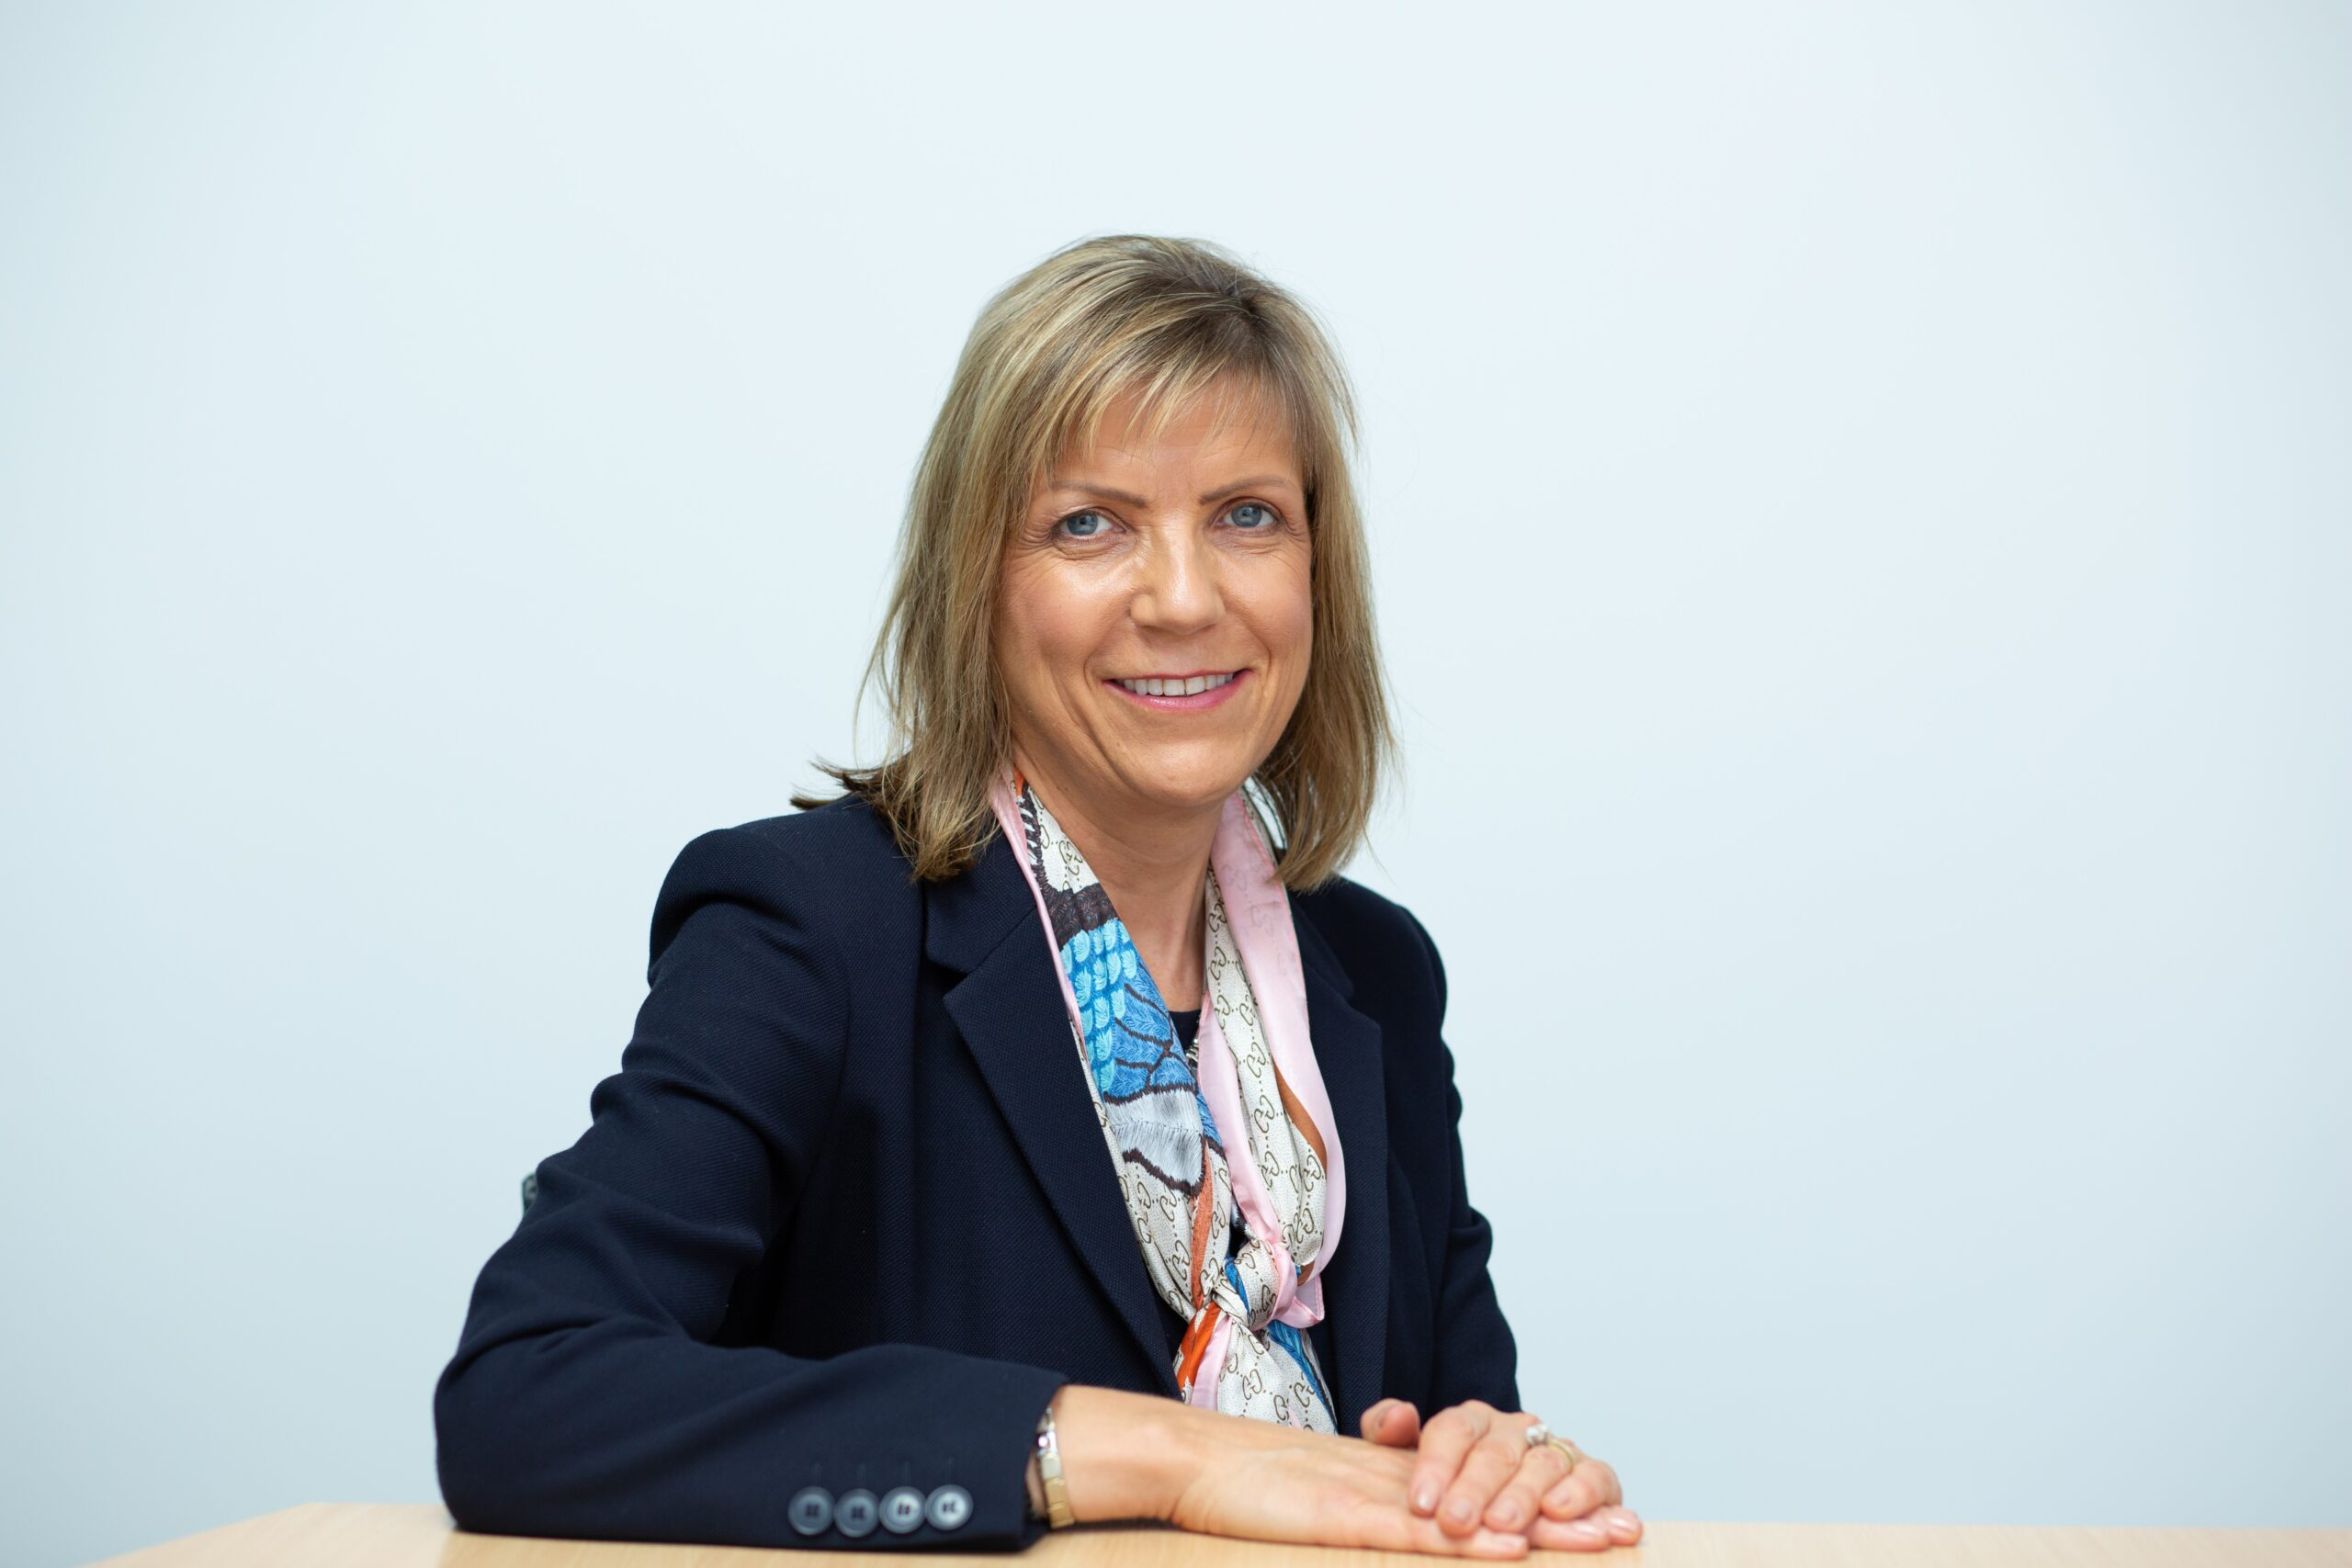 Christine Convy, Founder & Director of Dunedin Advisory Limited